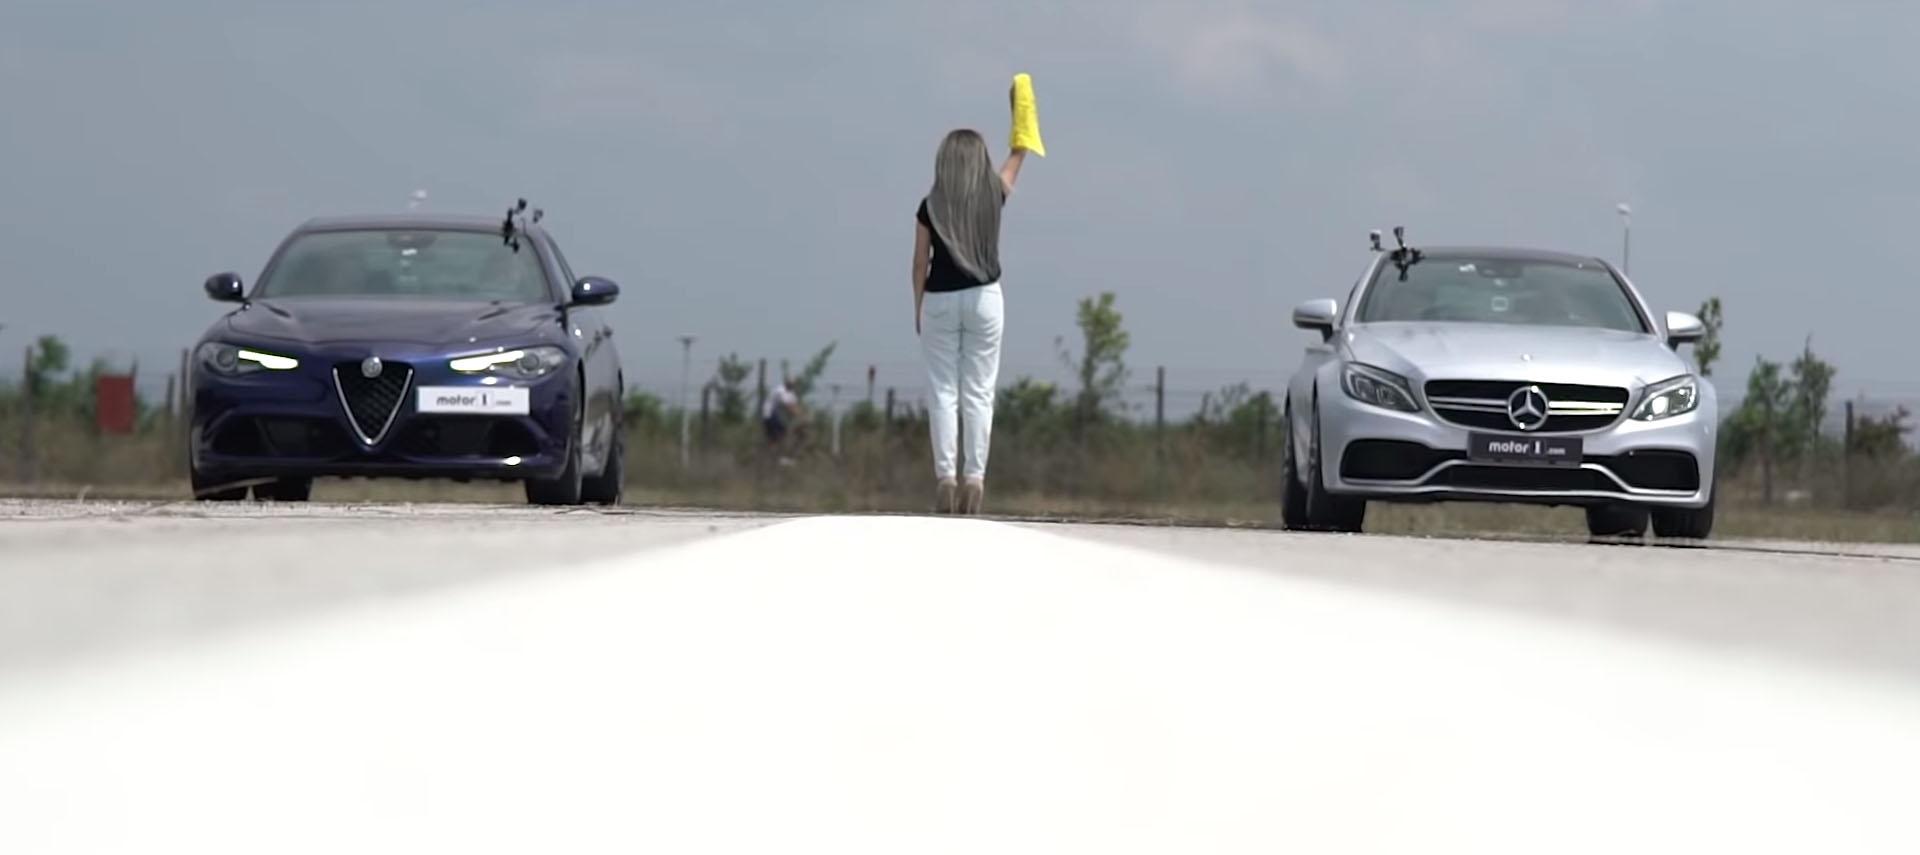 Alfa Romeo Giulia Quadrifoglio vs Mercedes-AMG C63 S Coupe / ВИДЕО